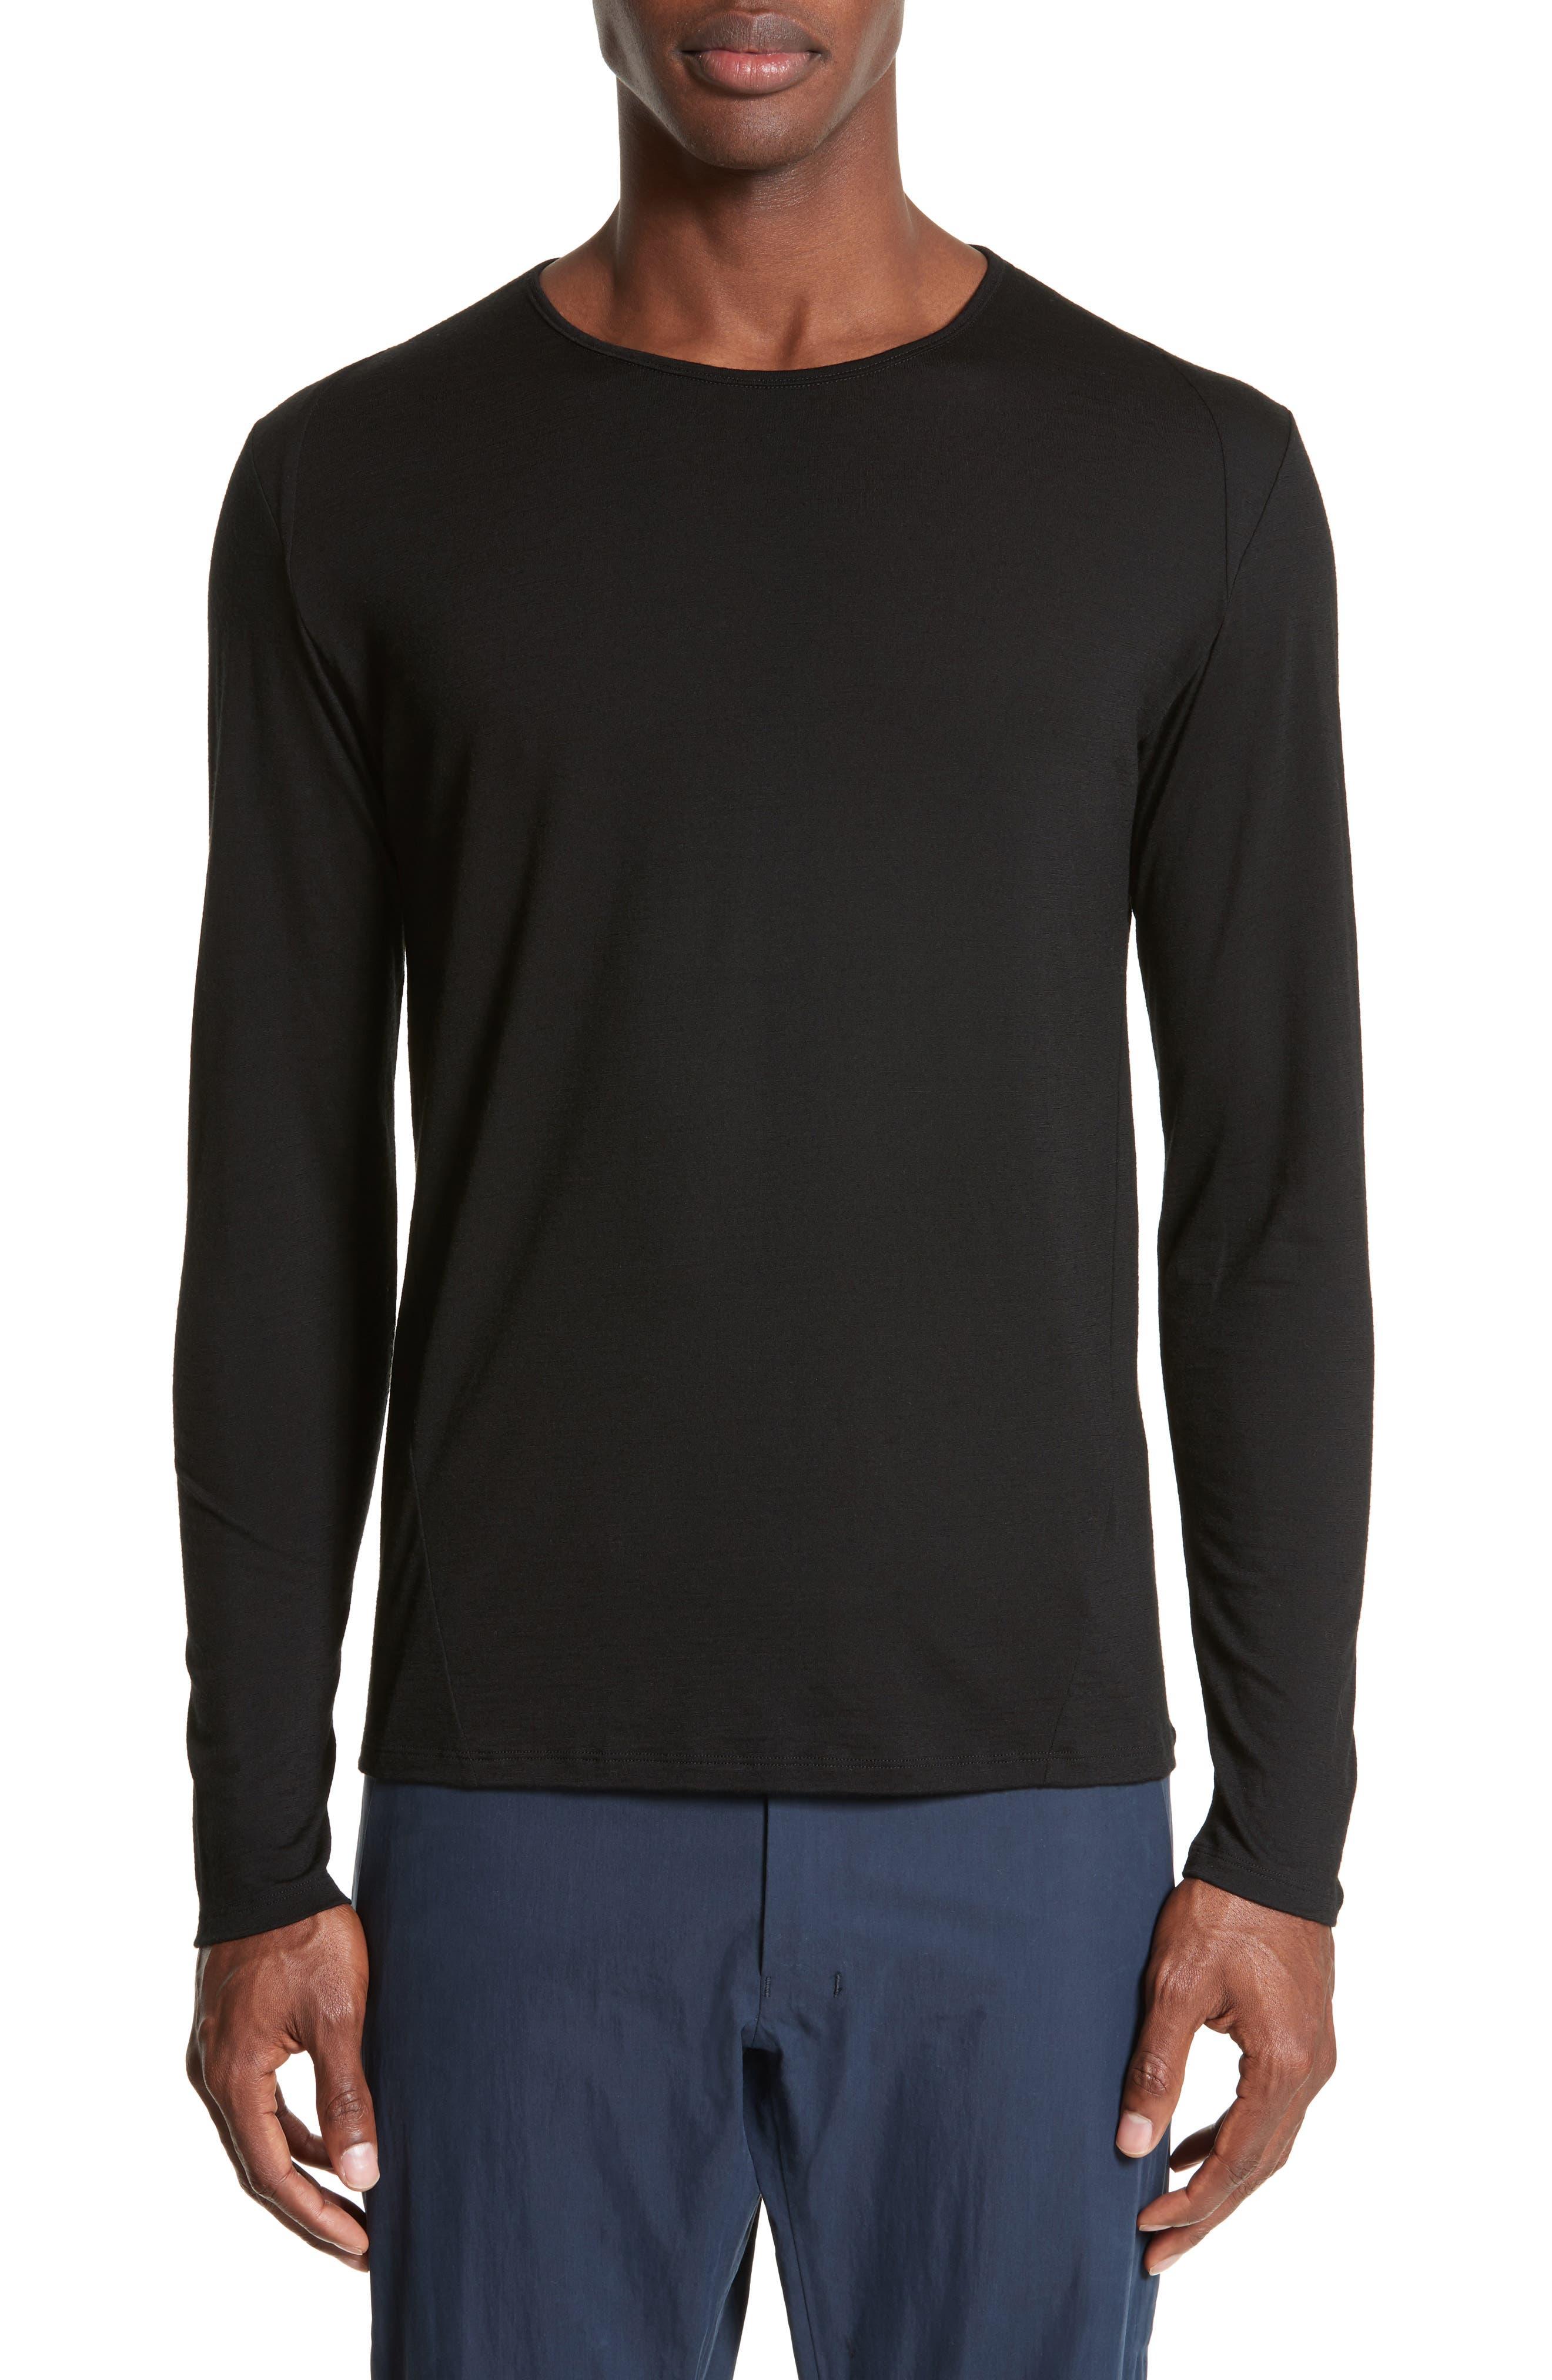 Alternate Image 1 Selected - Arc'teryx Veilance Frame Merino Wool T-Shirt